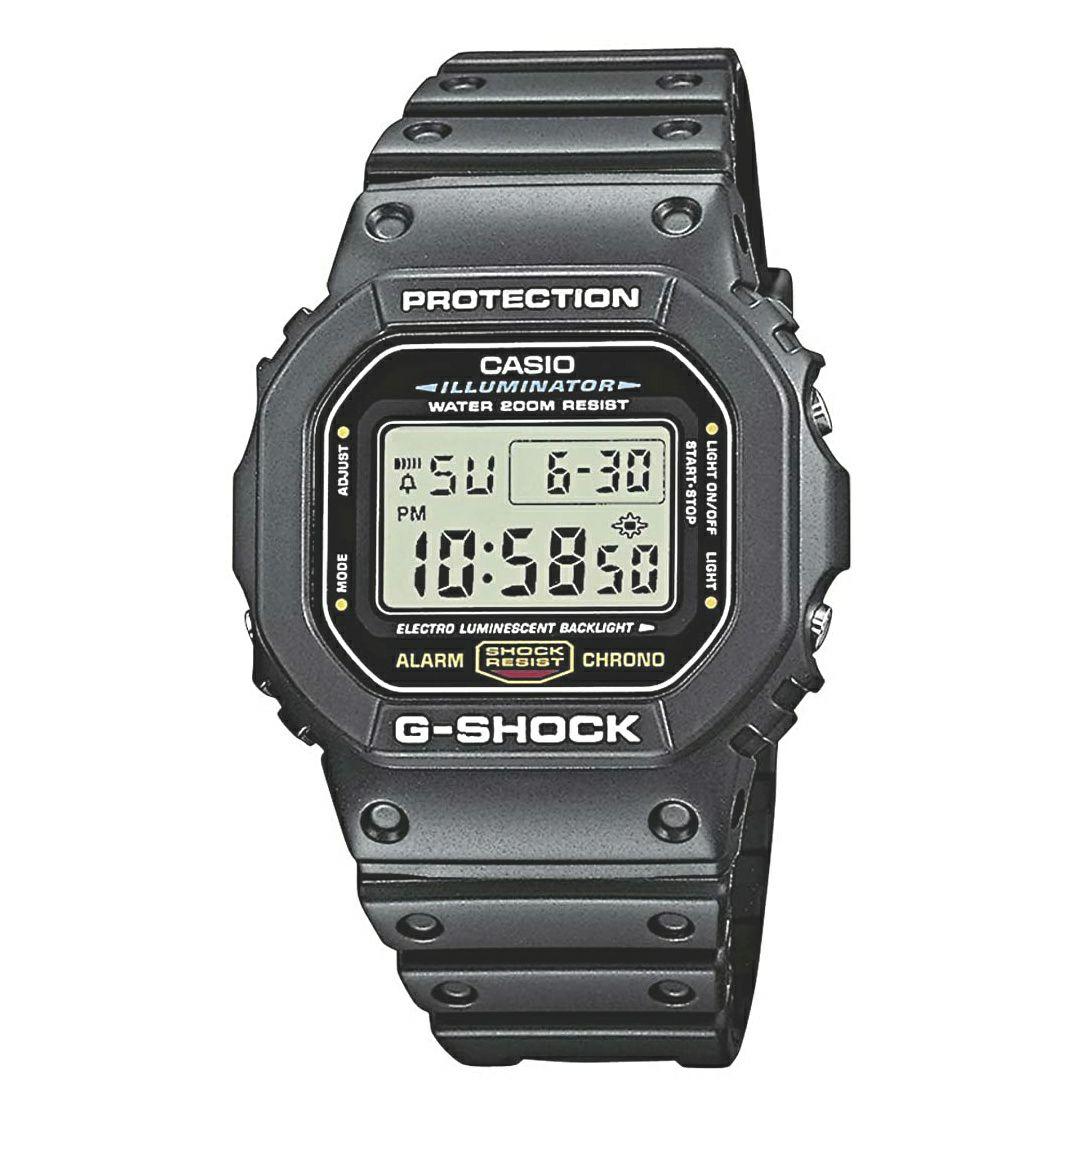 Amazon: Casio G-Shock DW-5600